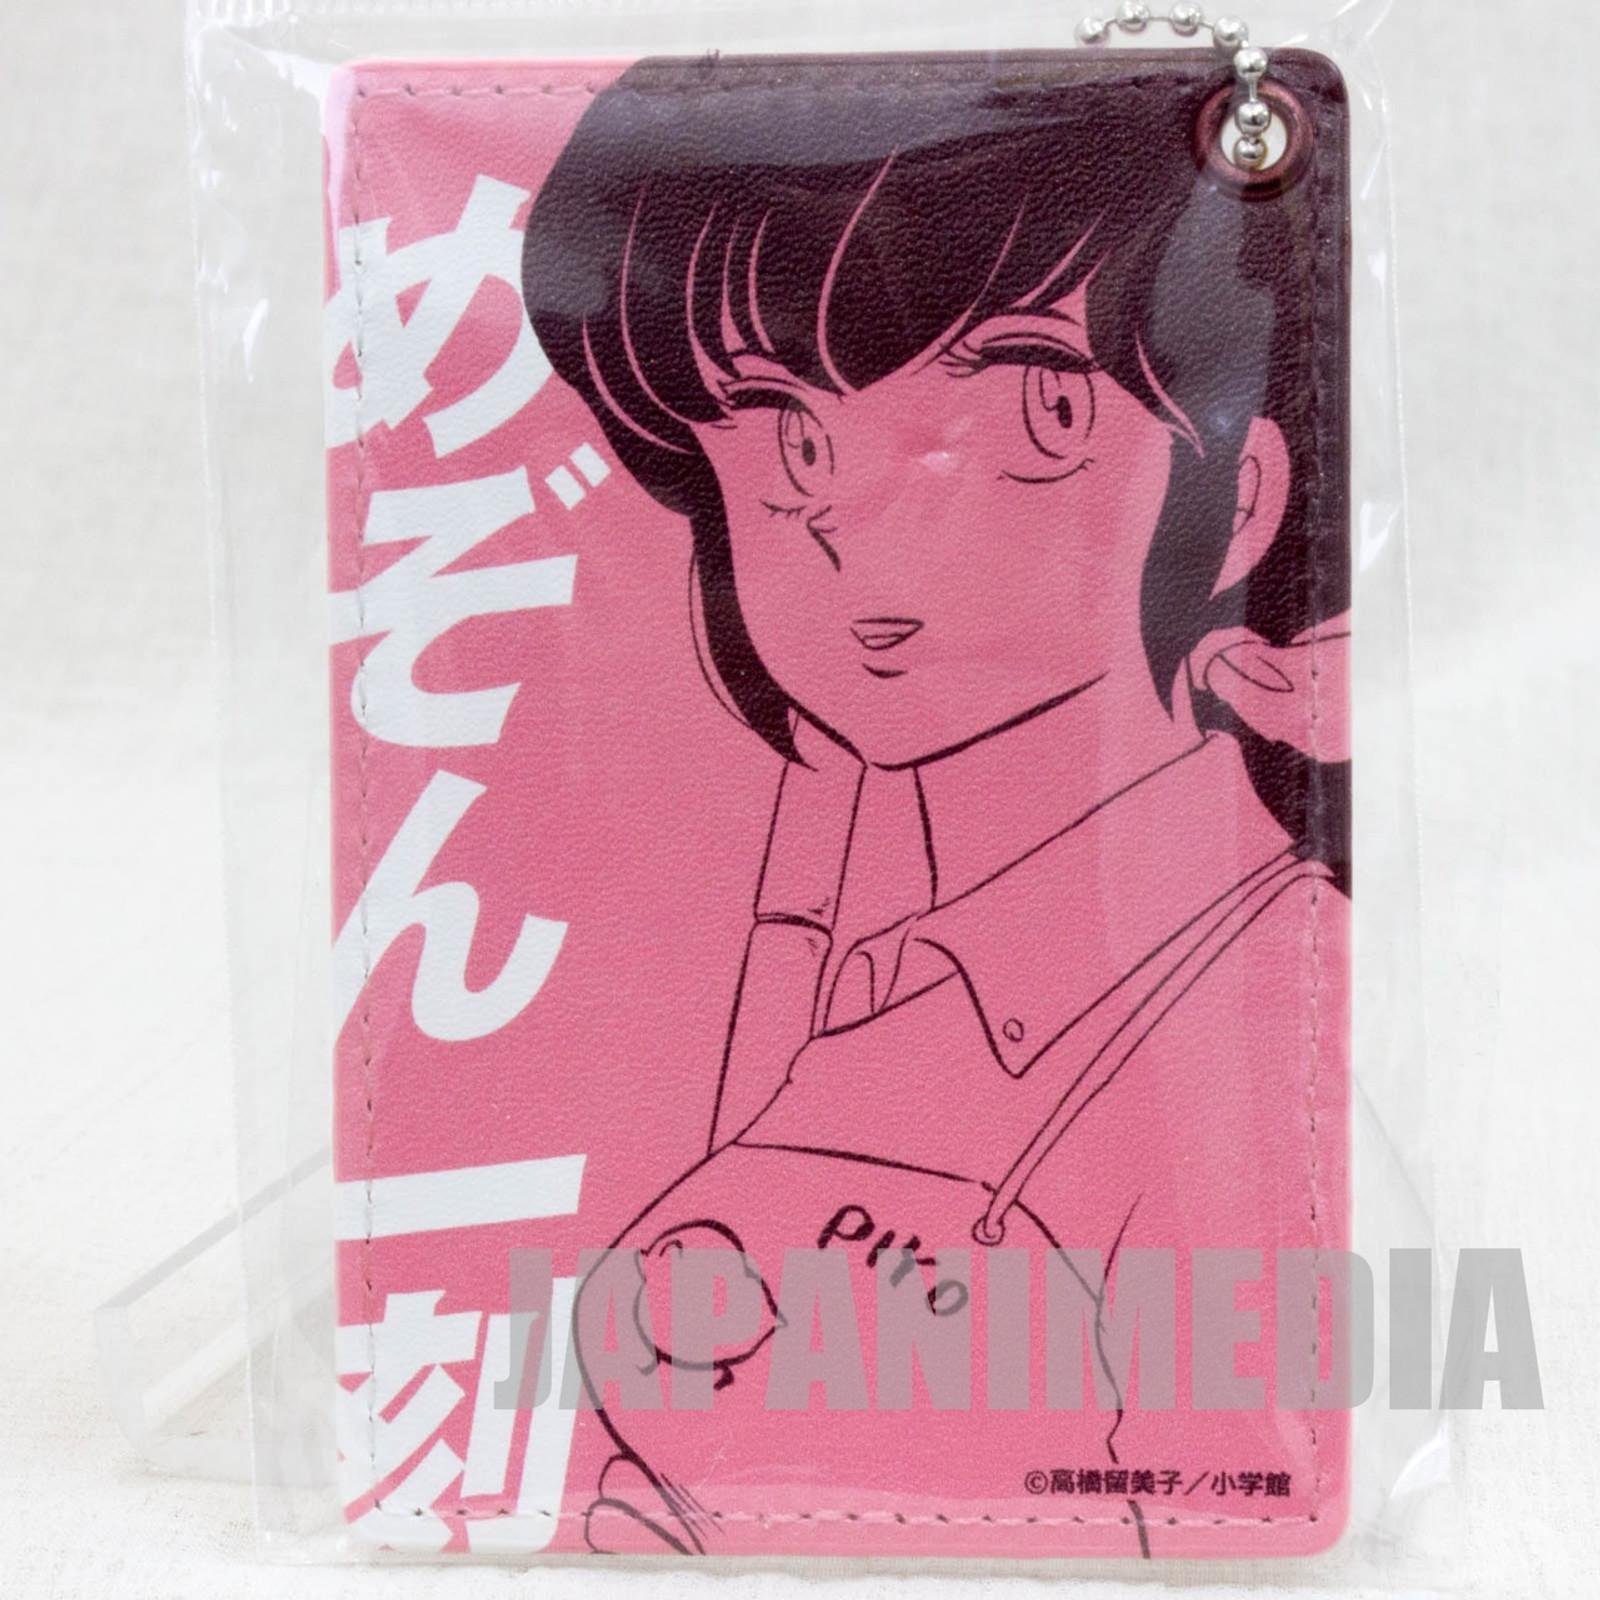 Maison Ikkoku Kyoko Otonashi Pass Card Case Holder JAPAN ANIME MANGA 1